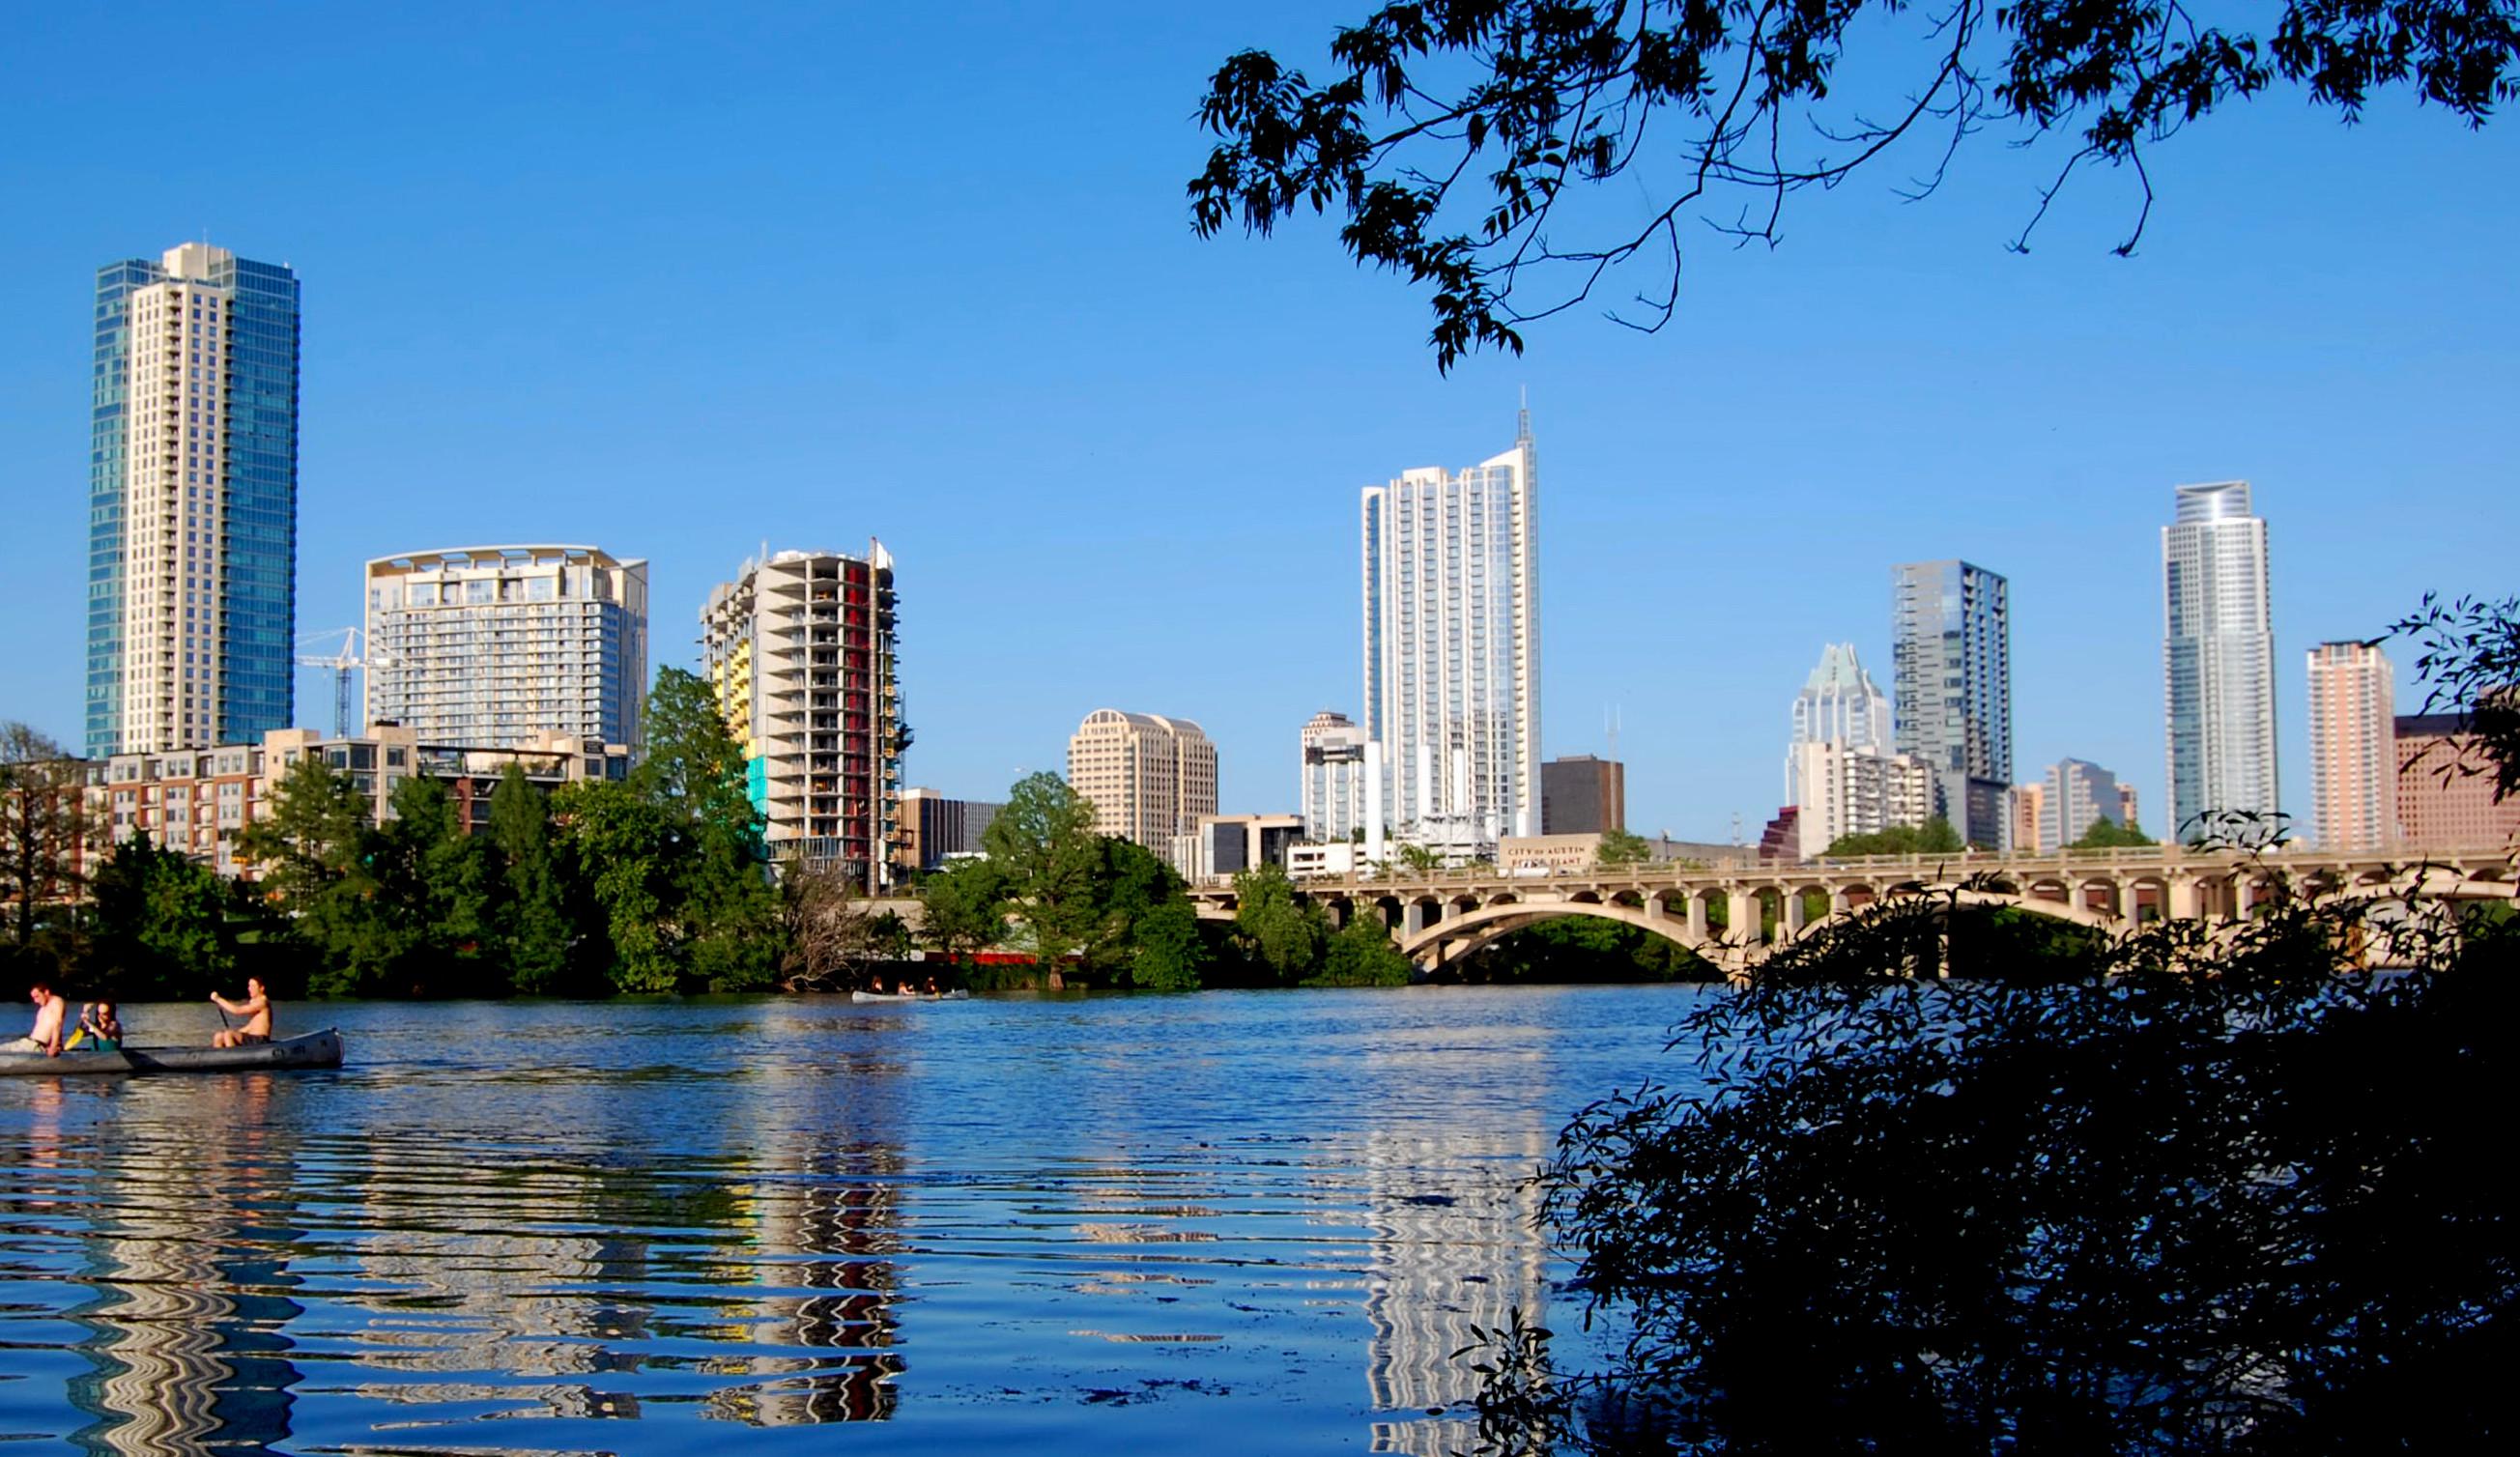 Austin, TX skyline in 2013